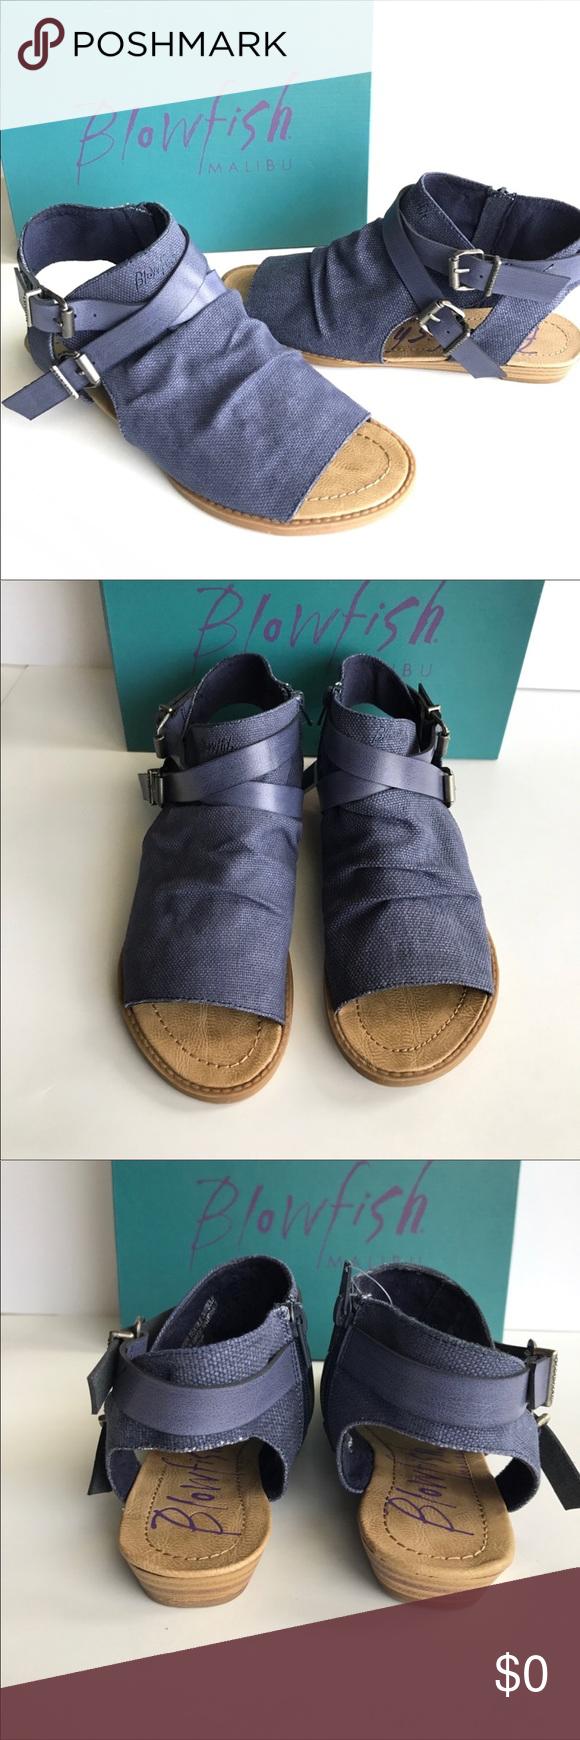 b7f1c46645bd BLOWFISH Brand New! Brisa Indigo Rancher Sandal BRAND NEW IN BOX! Trendy  and beautiful